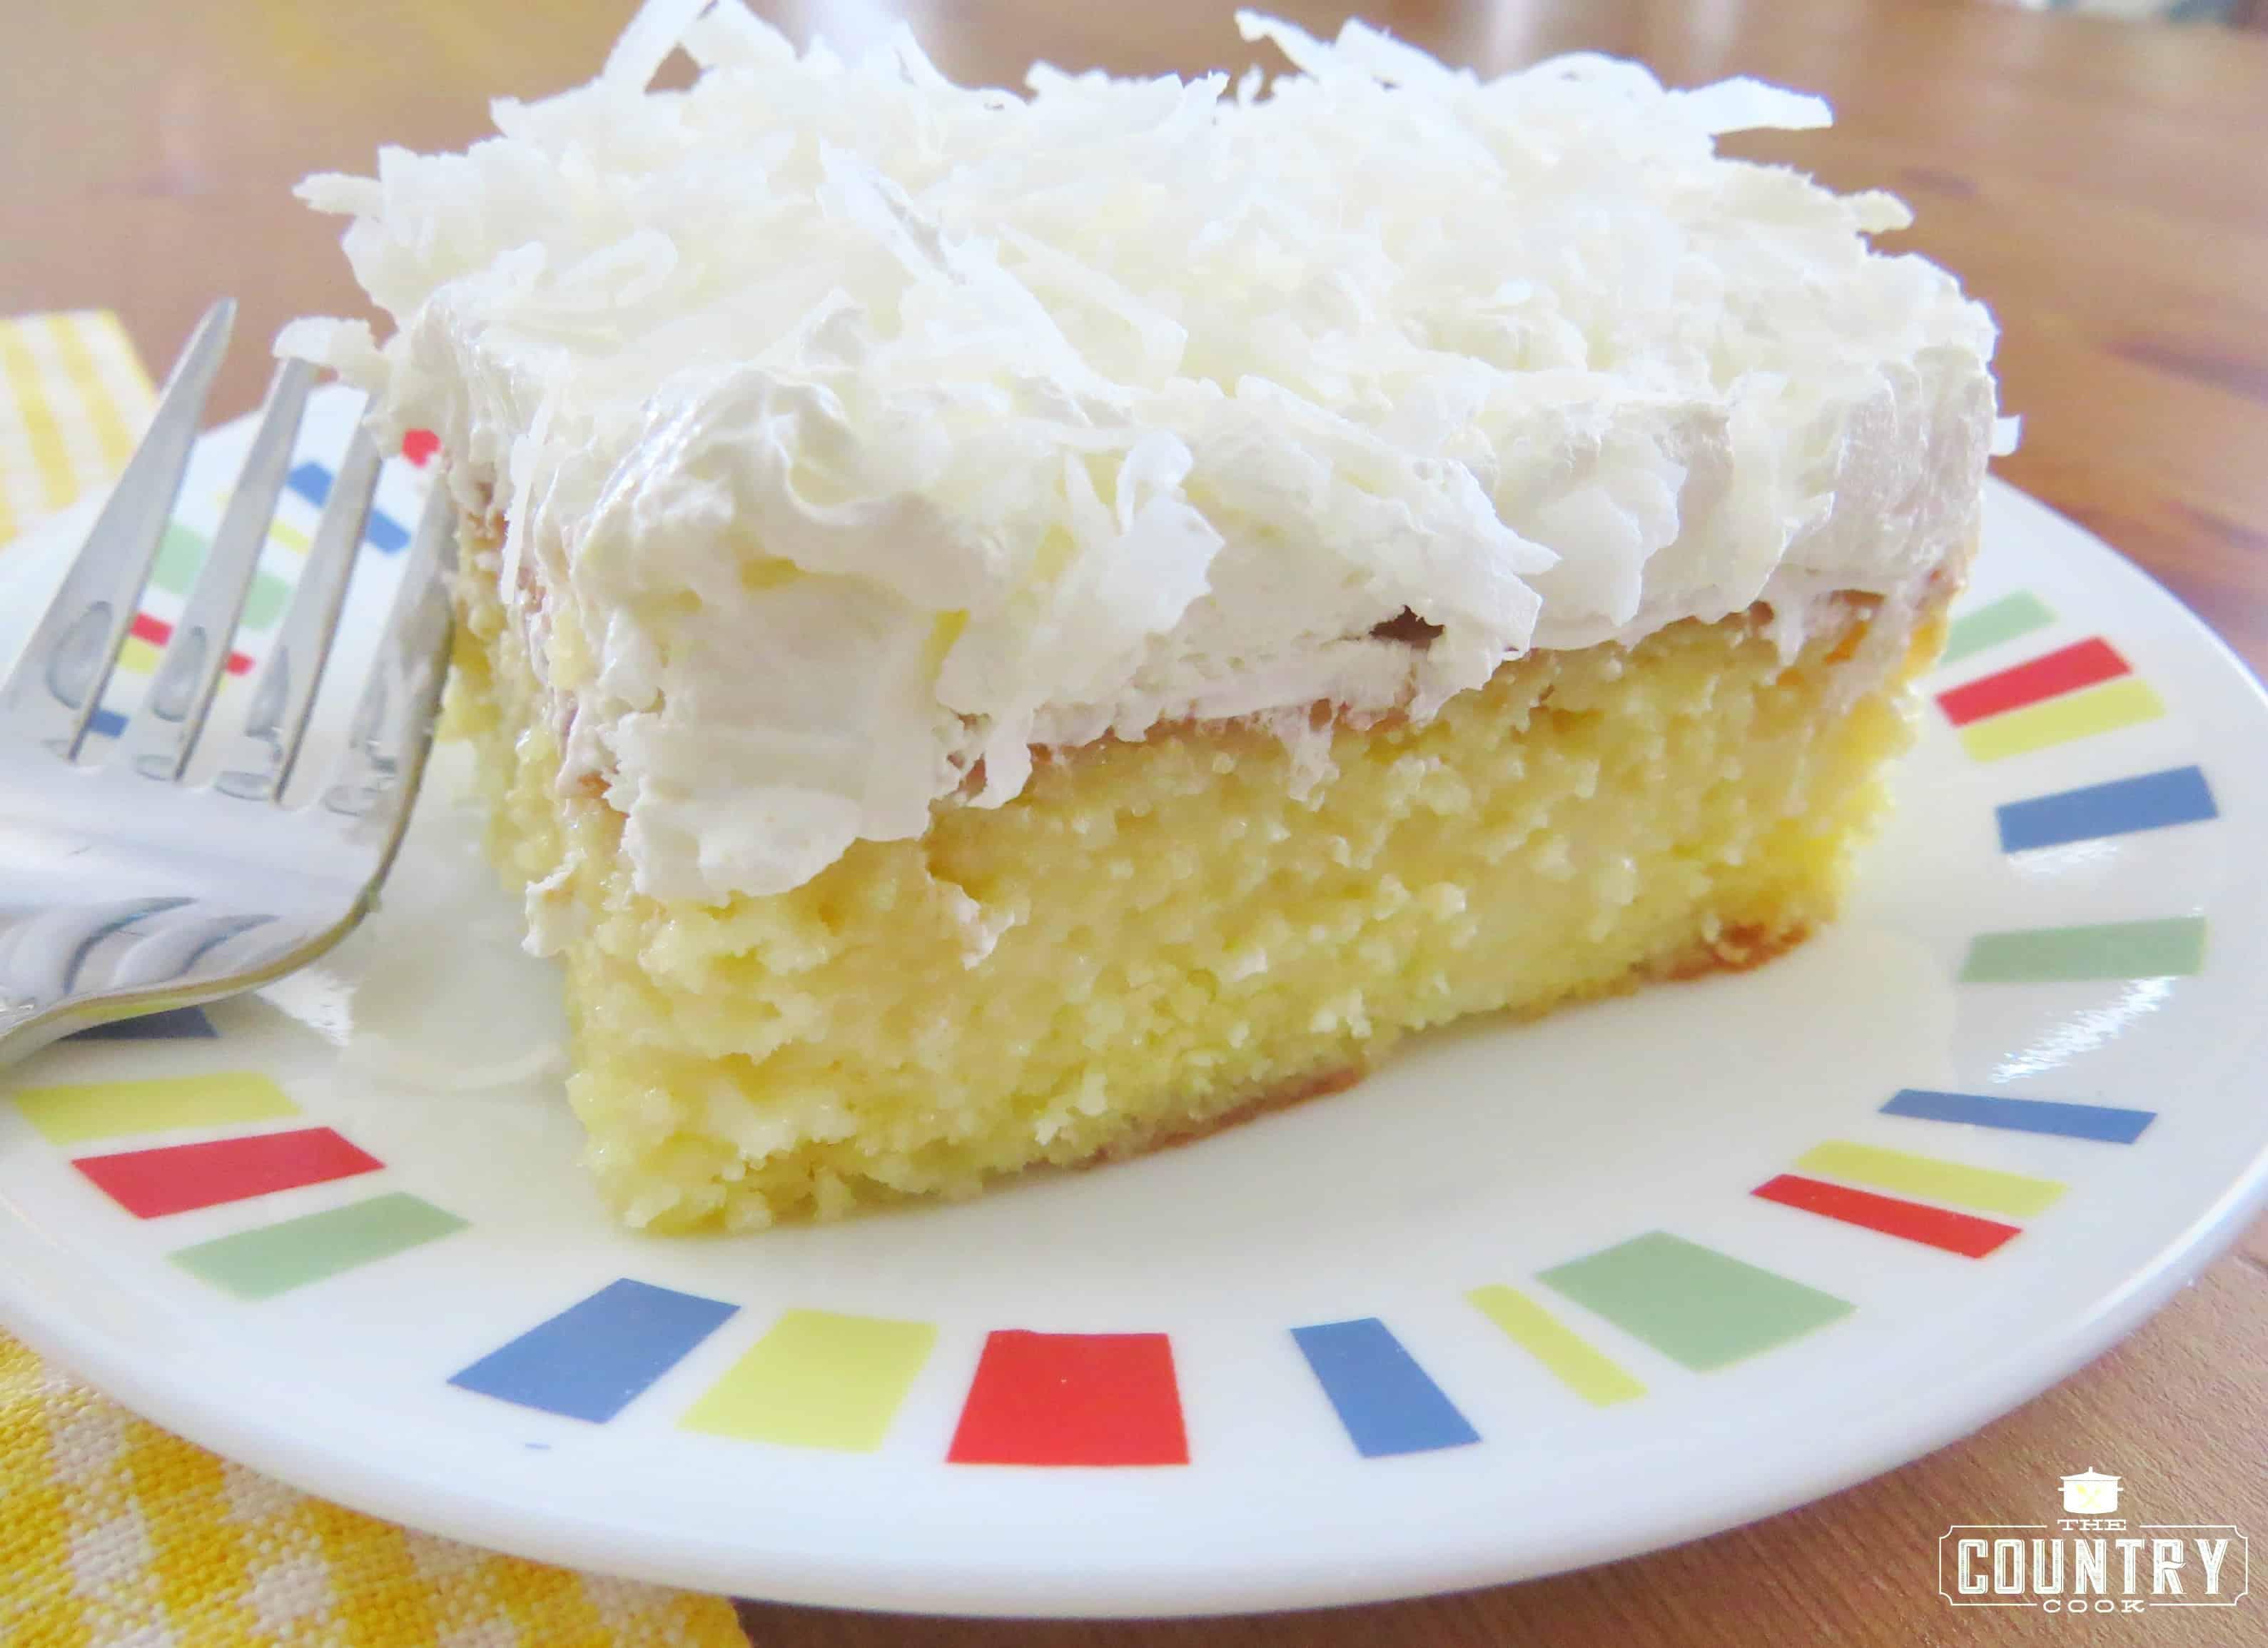 How To Make Pina Colada Cake Filling